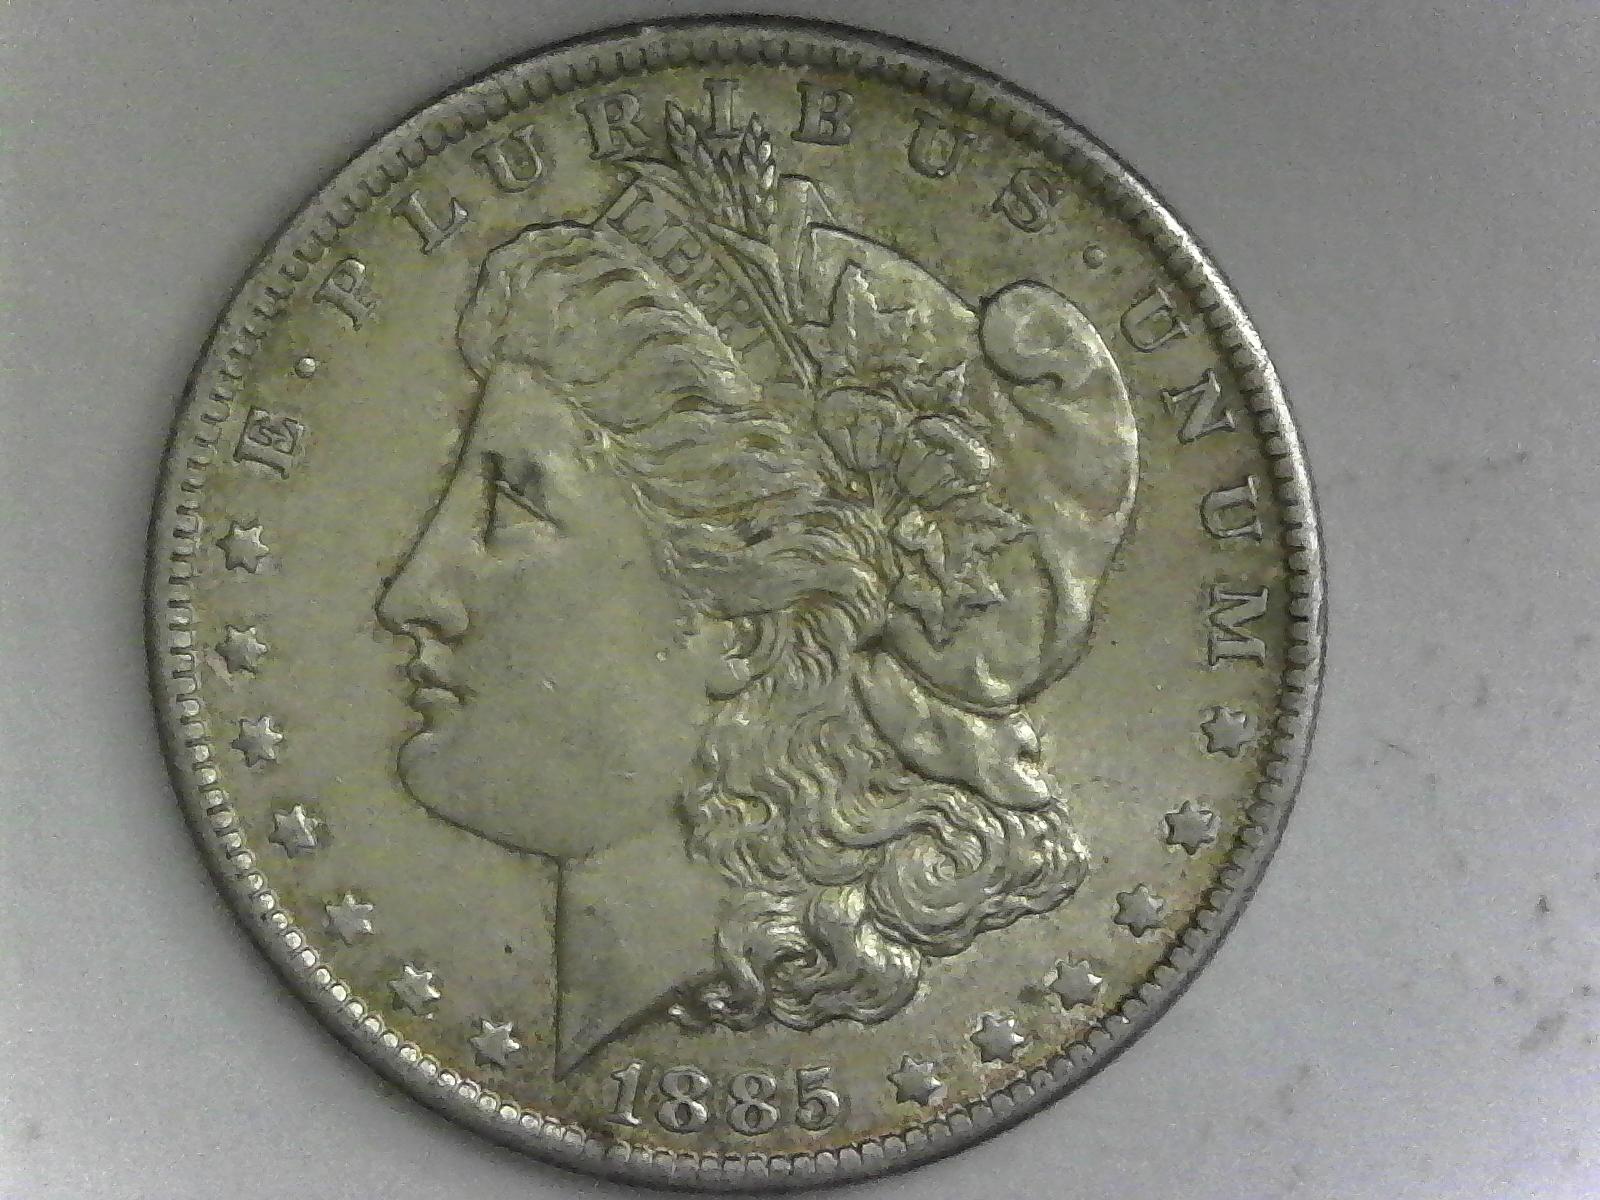 1885 Morgan Silver Dollar $100